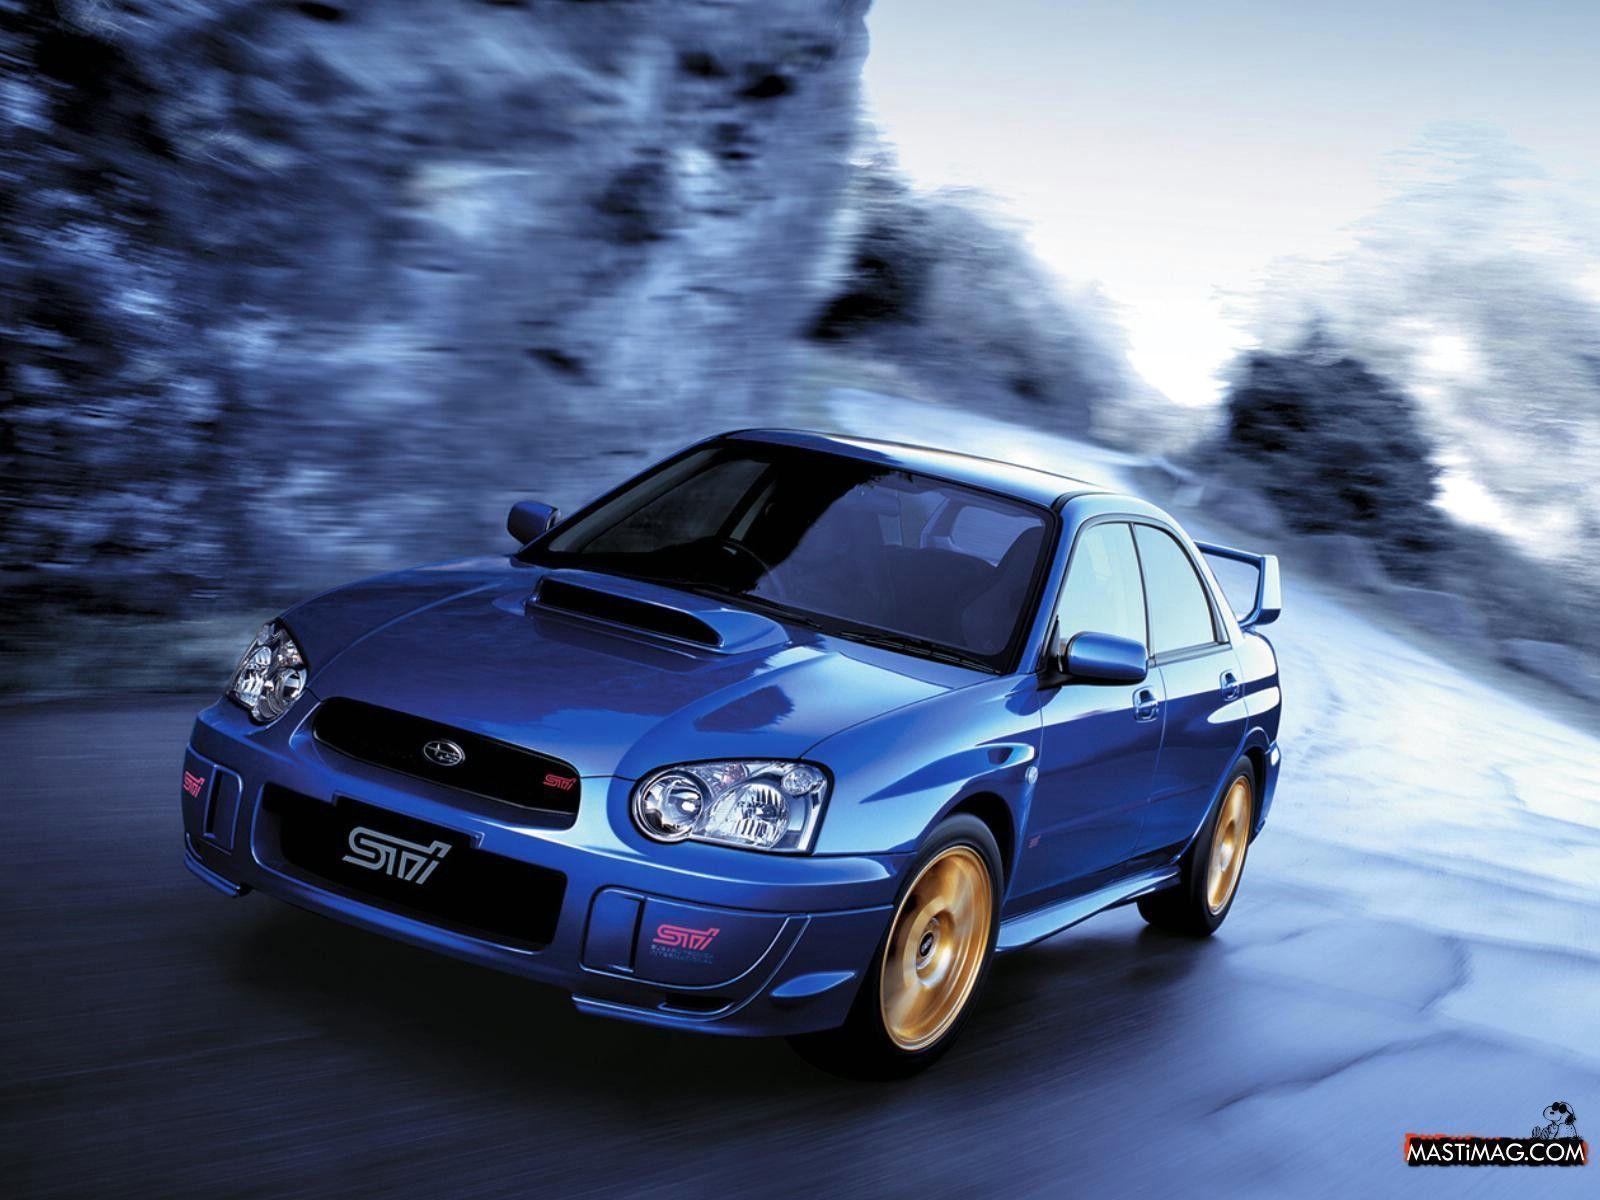 Subaru Wrx Sti Wallpapers Wallpaper Cave